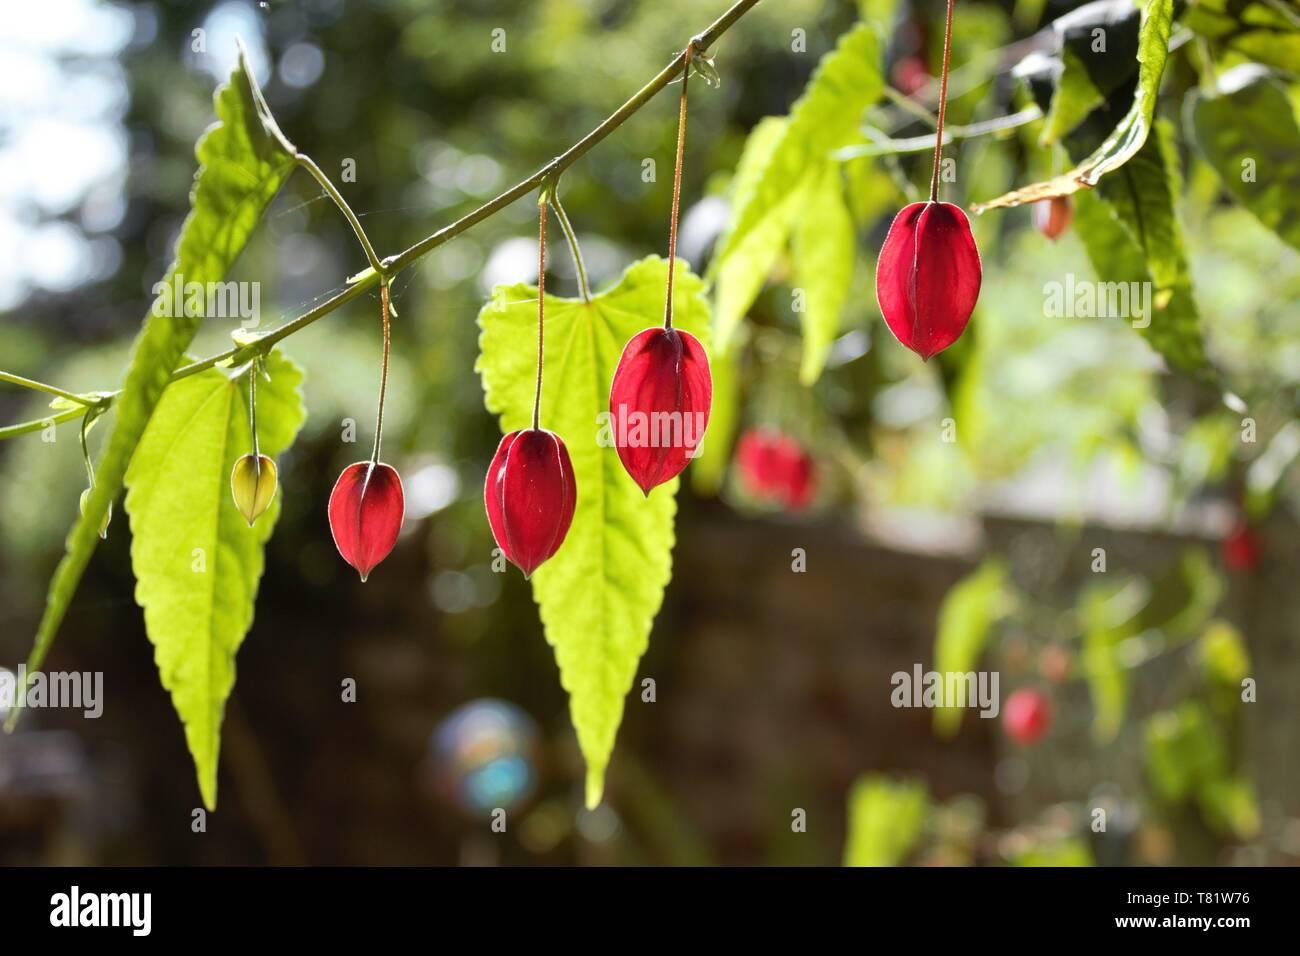 The Red Calyx Of A Trailing Abutilon Abutilon Megapotamicum Just